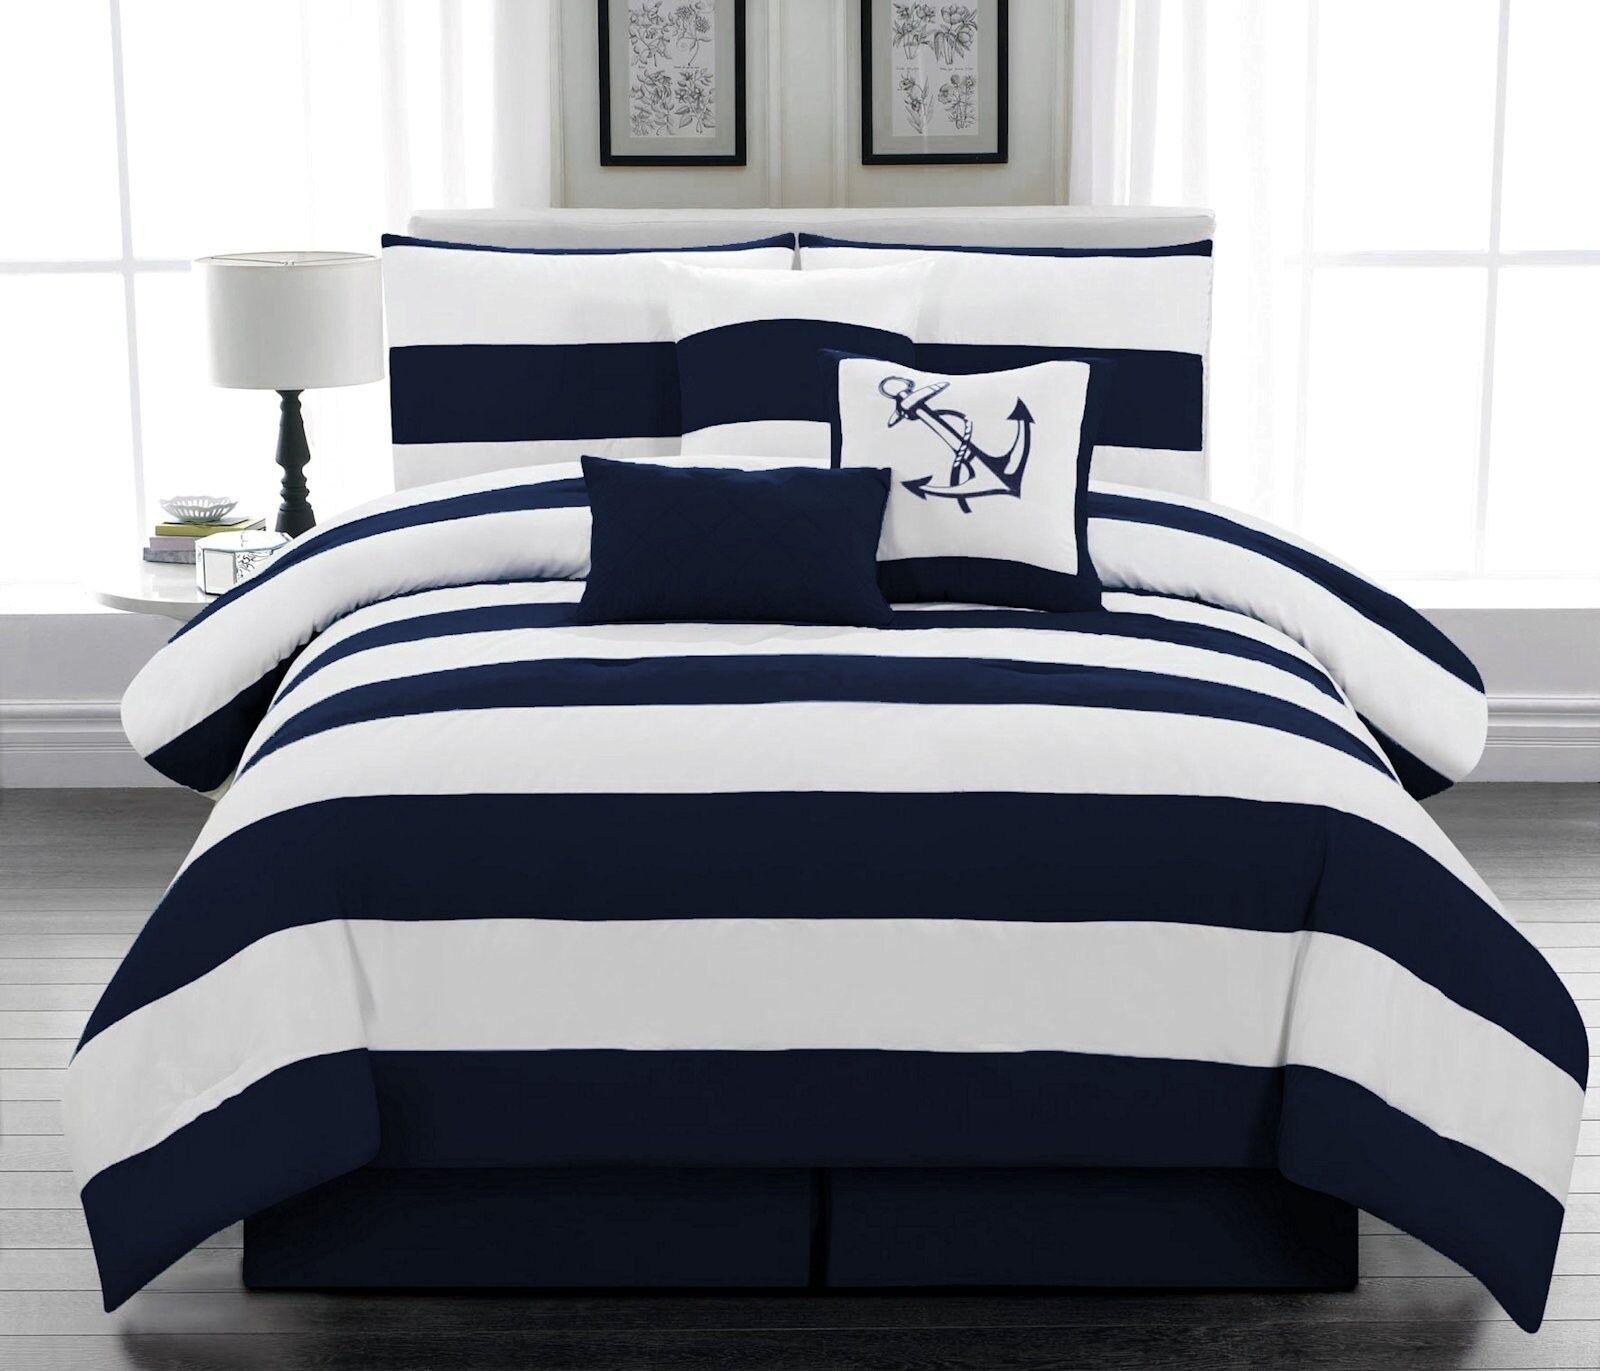 TWIN Full Queen King Comforter Nautical Navy Soft Microfiber 7-PCS Bedding Set